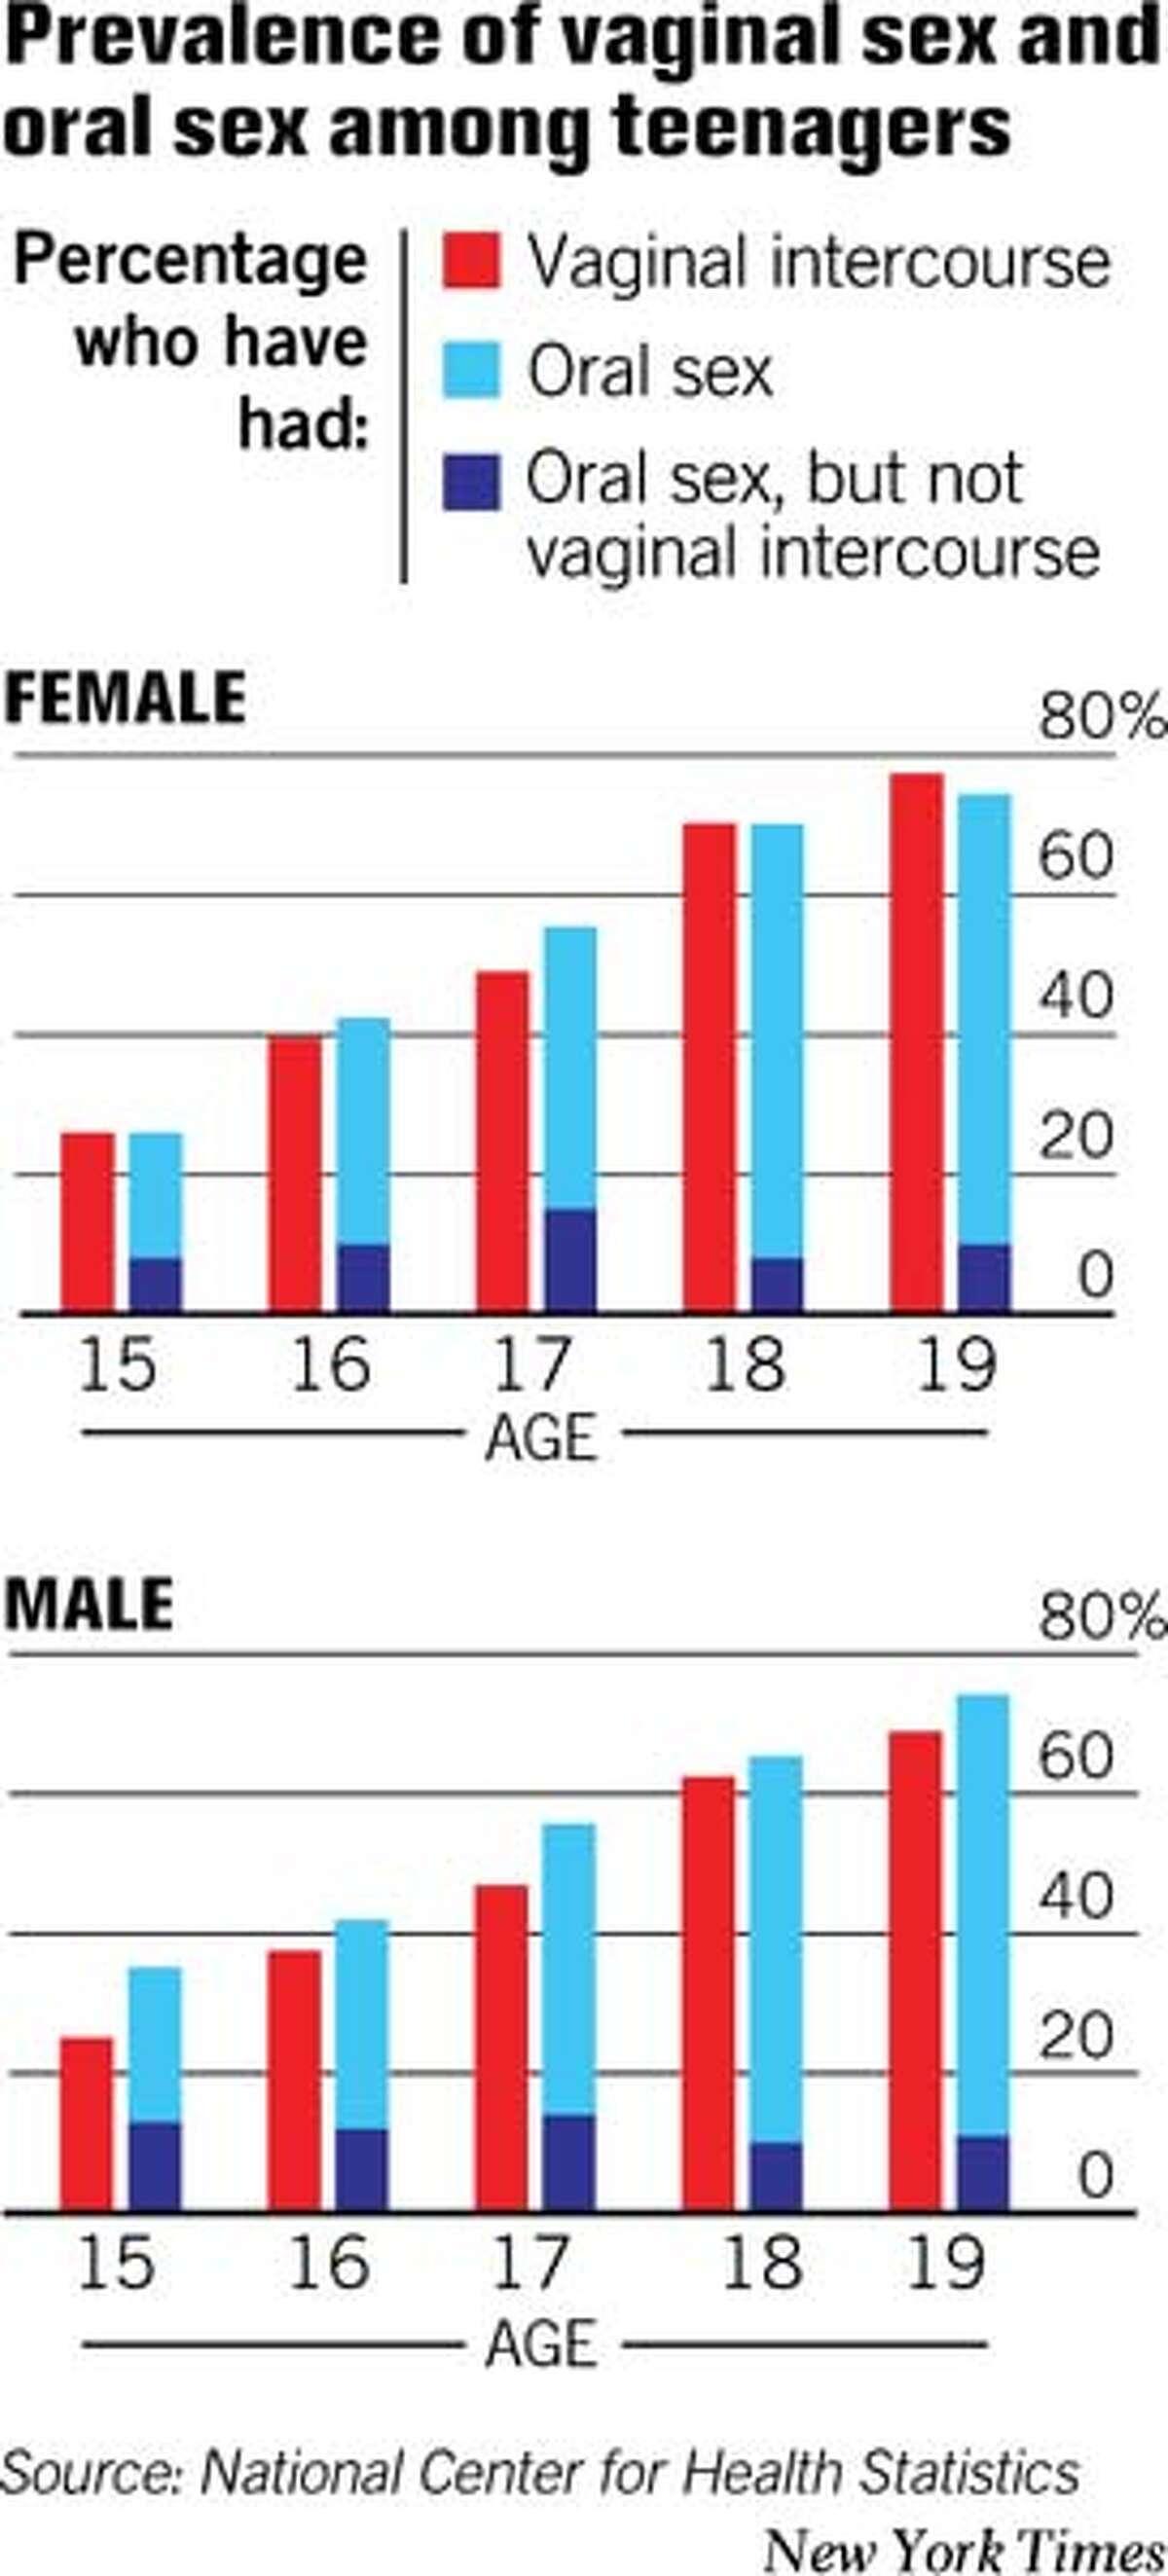 Prevalence of Sex - New York Times